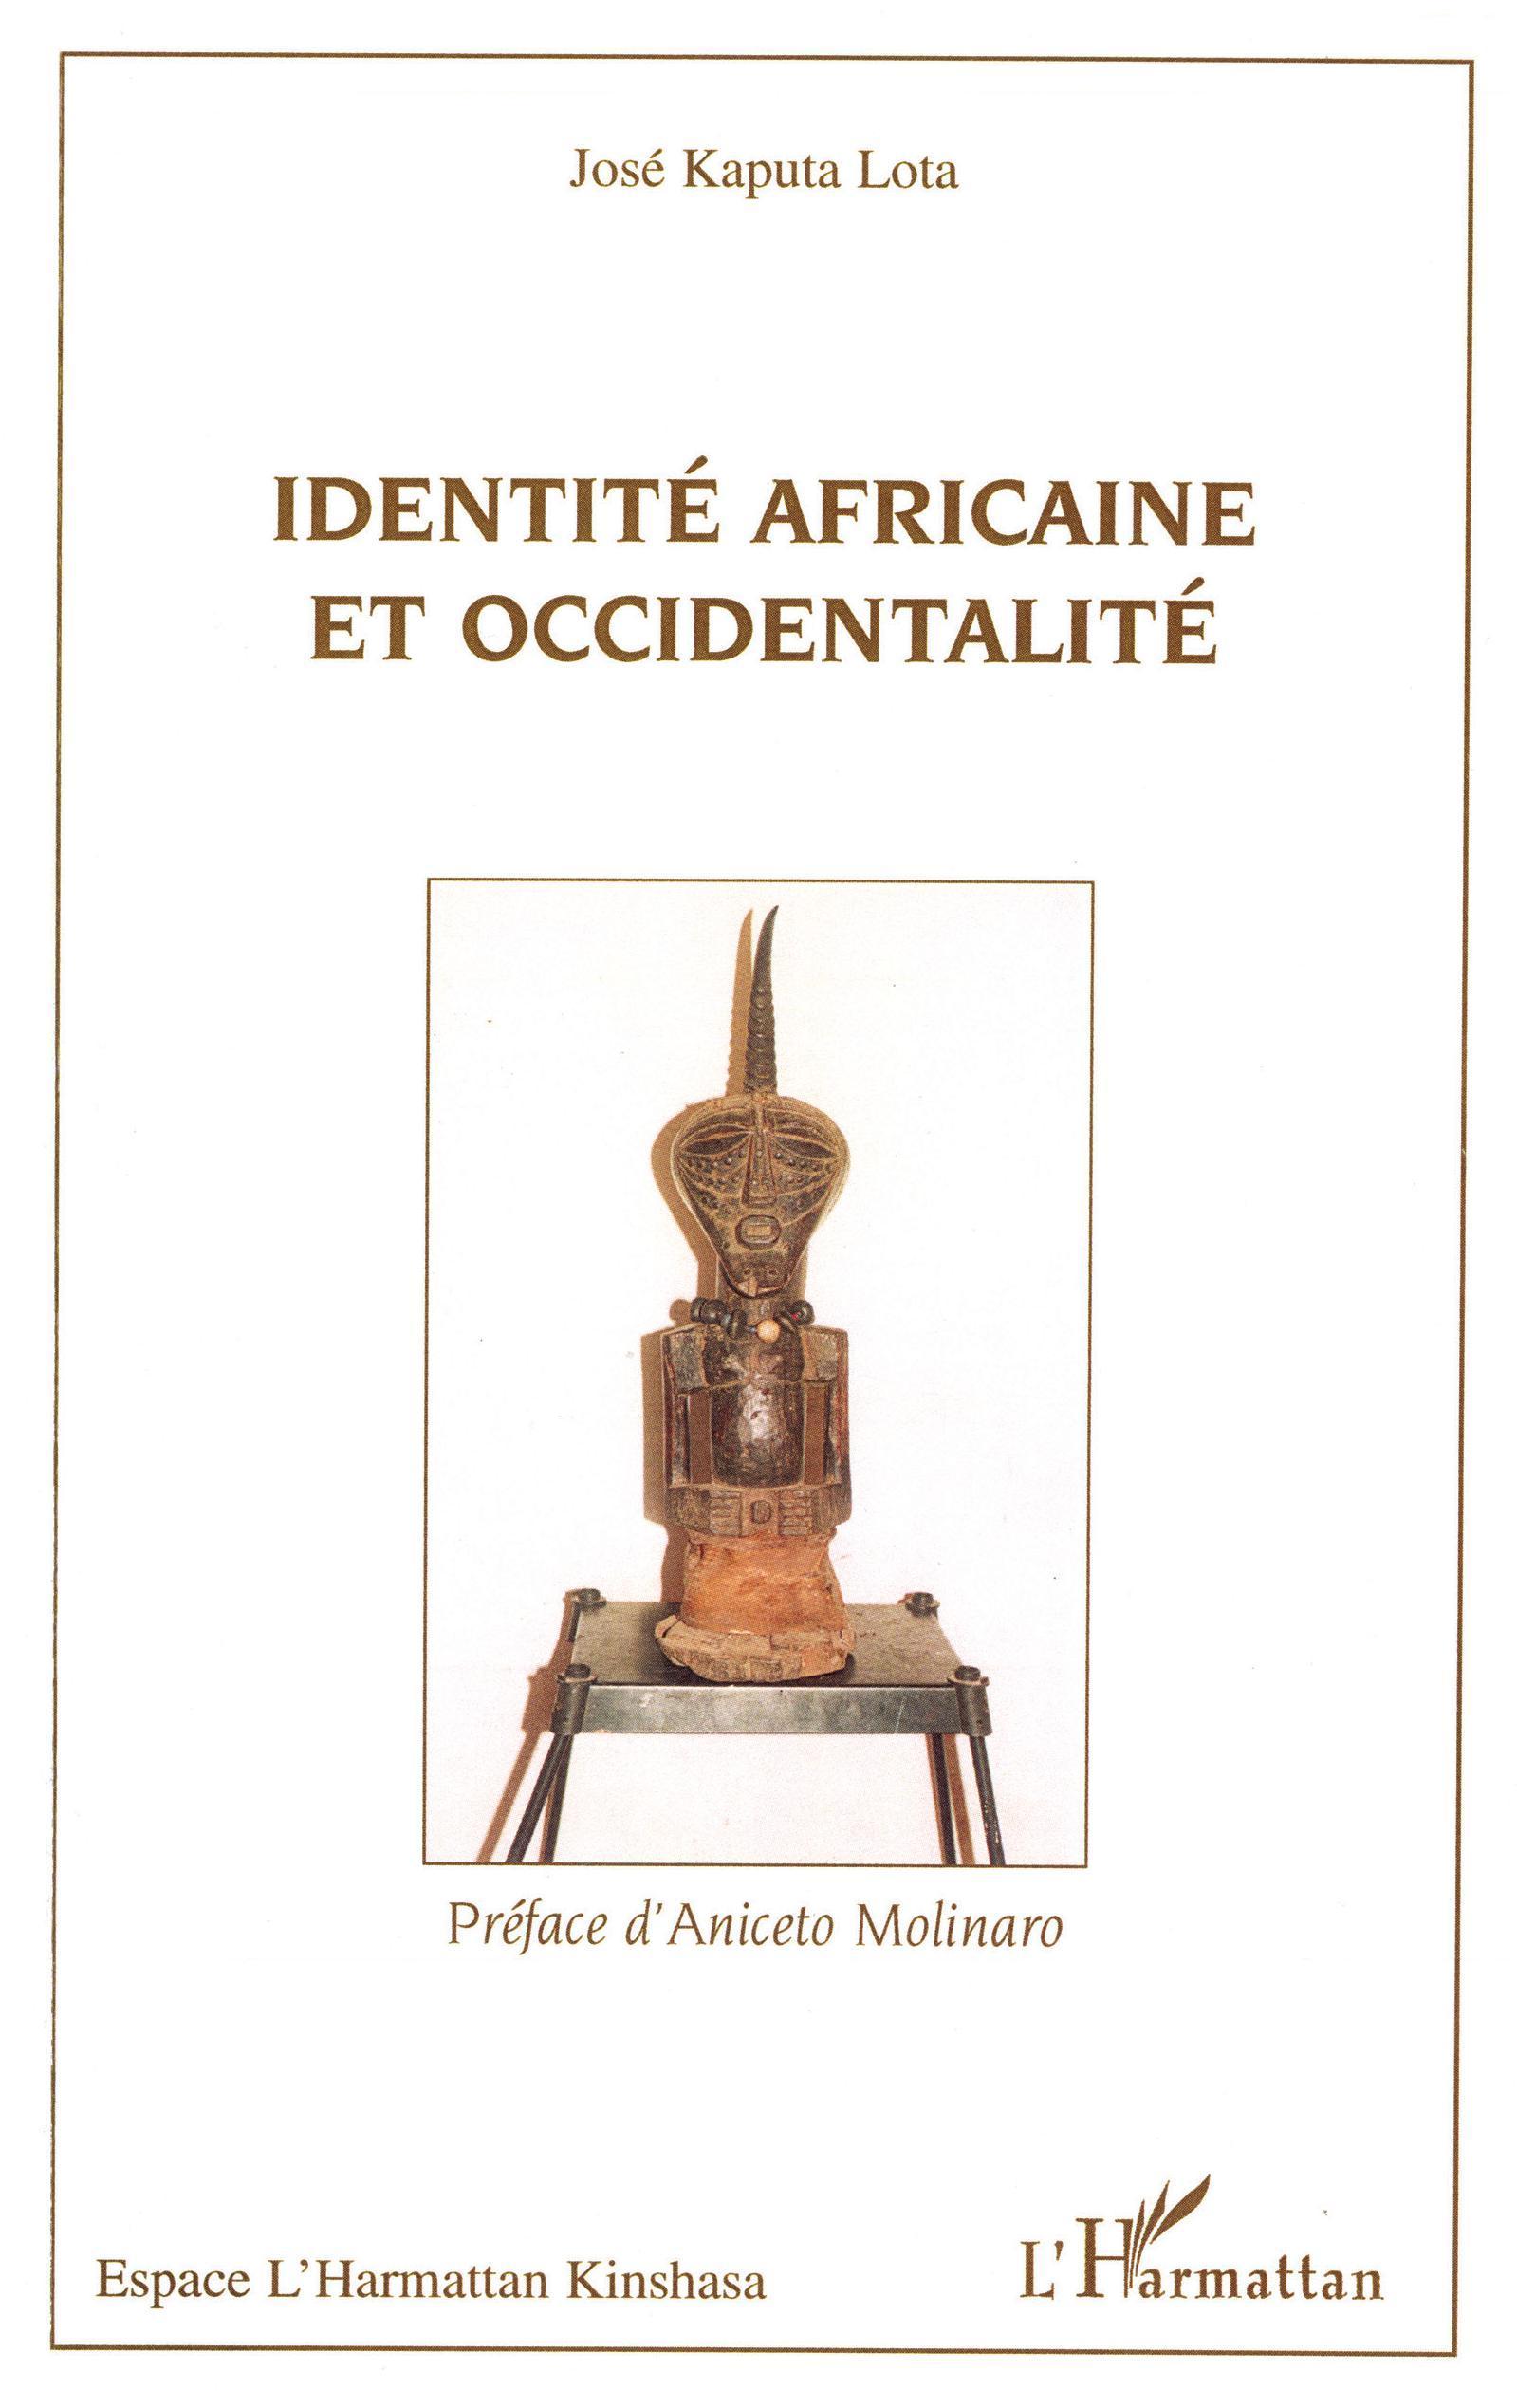 IDENTITE AFRICAINE ET OCCIDENTALITE